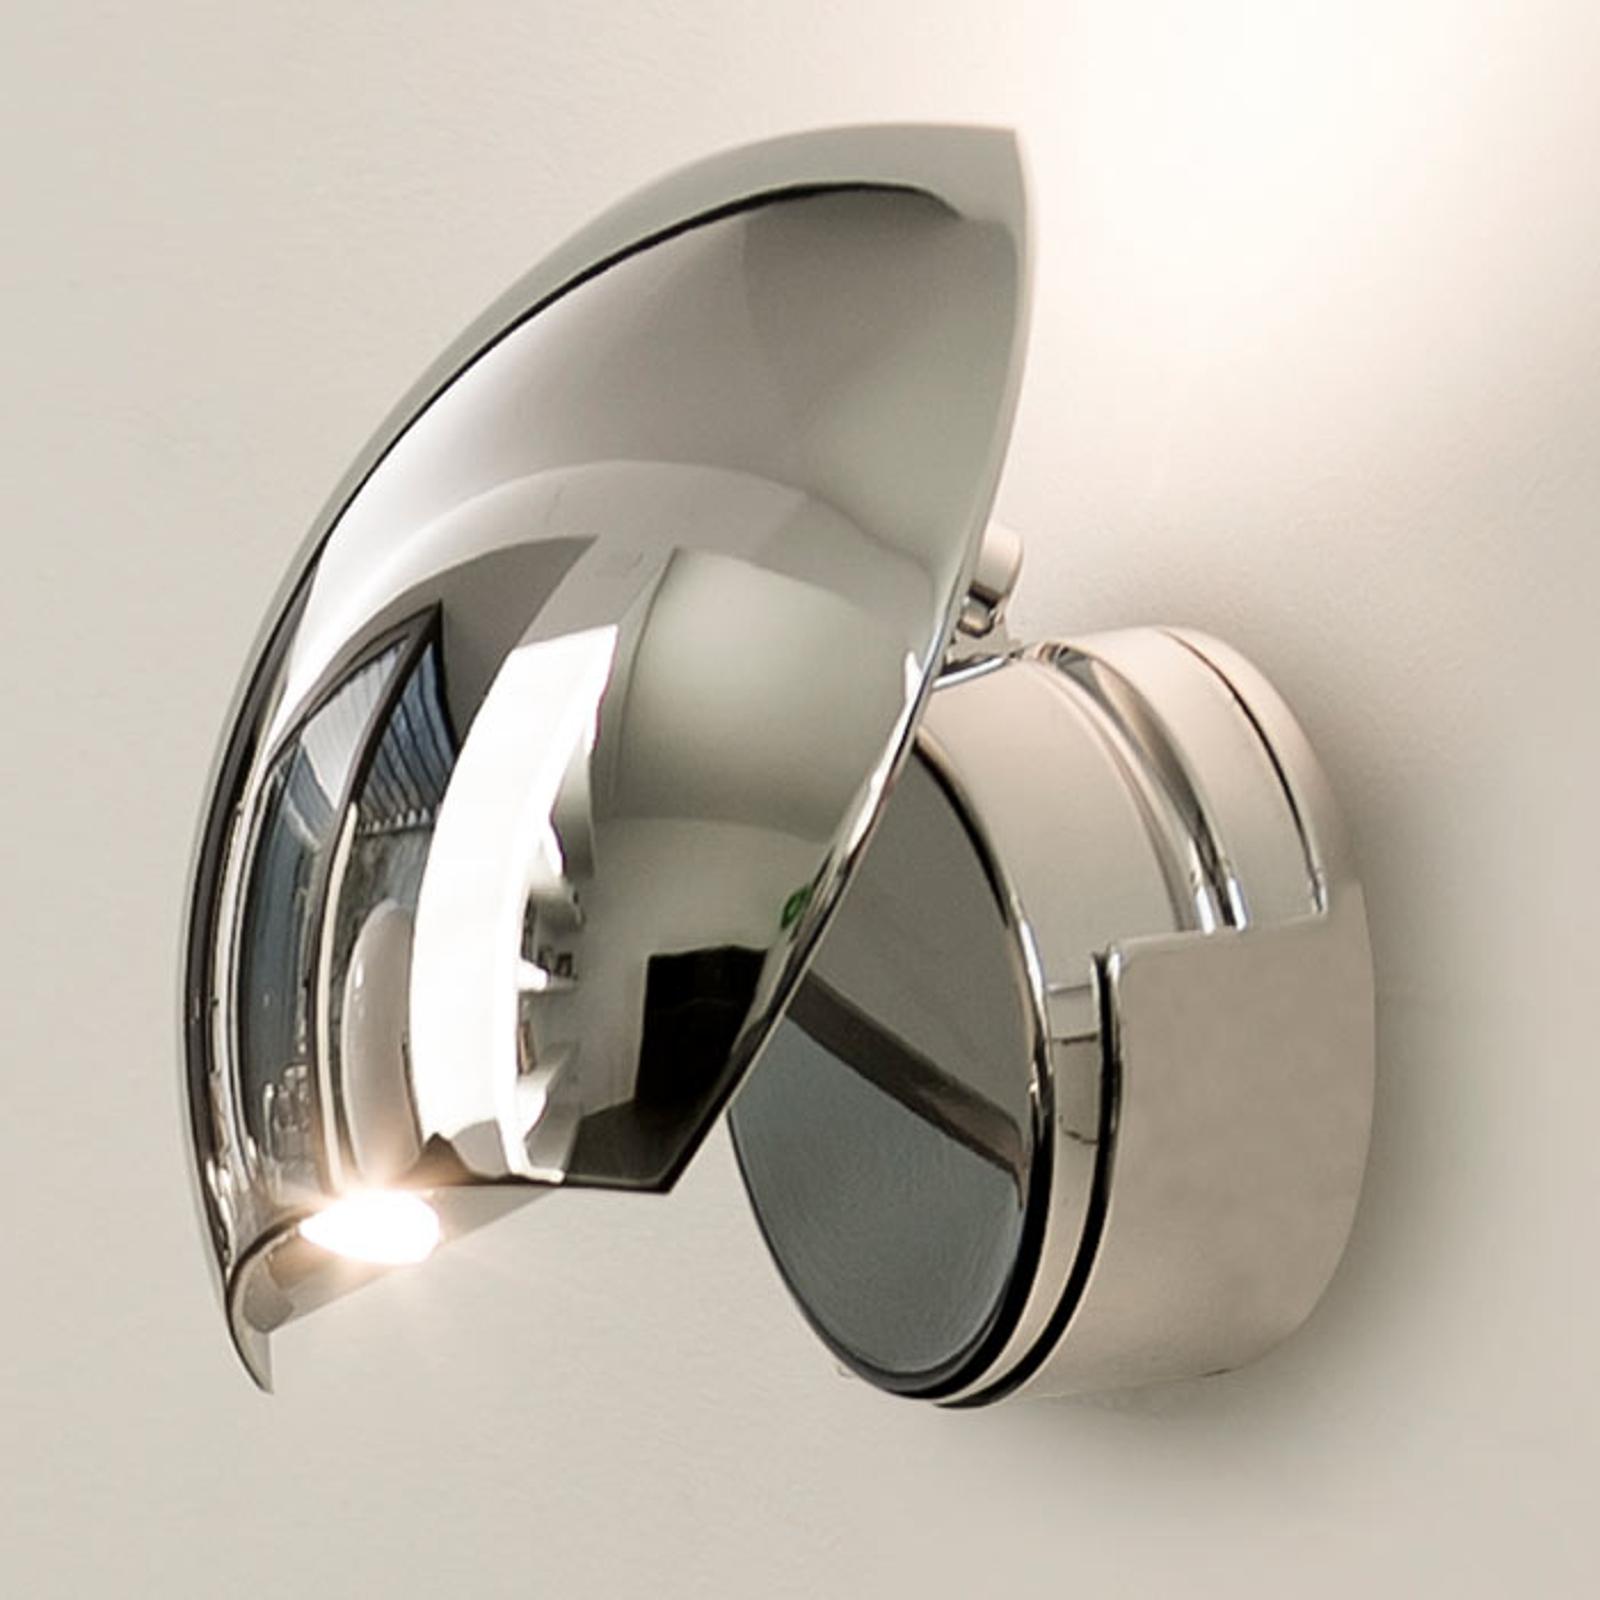 Chroomglanzende LED wandlamp Swing, instelbaar